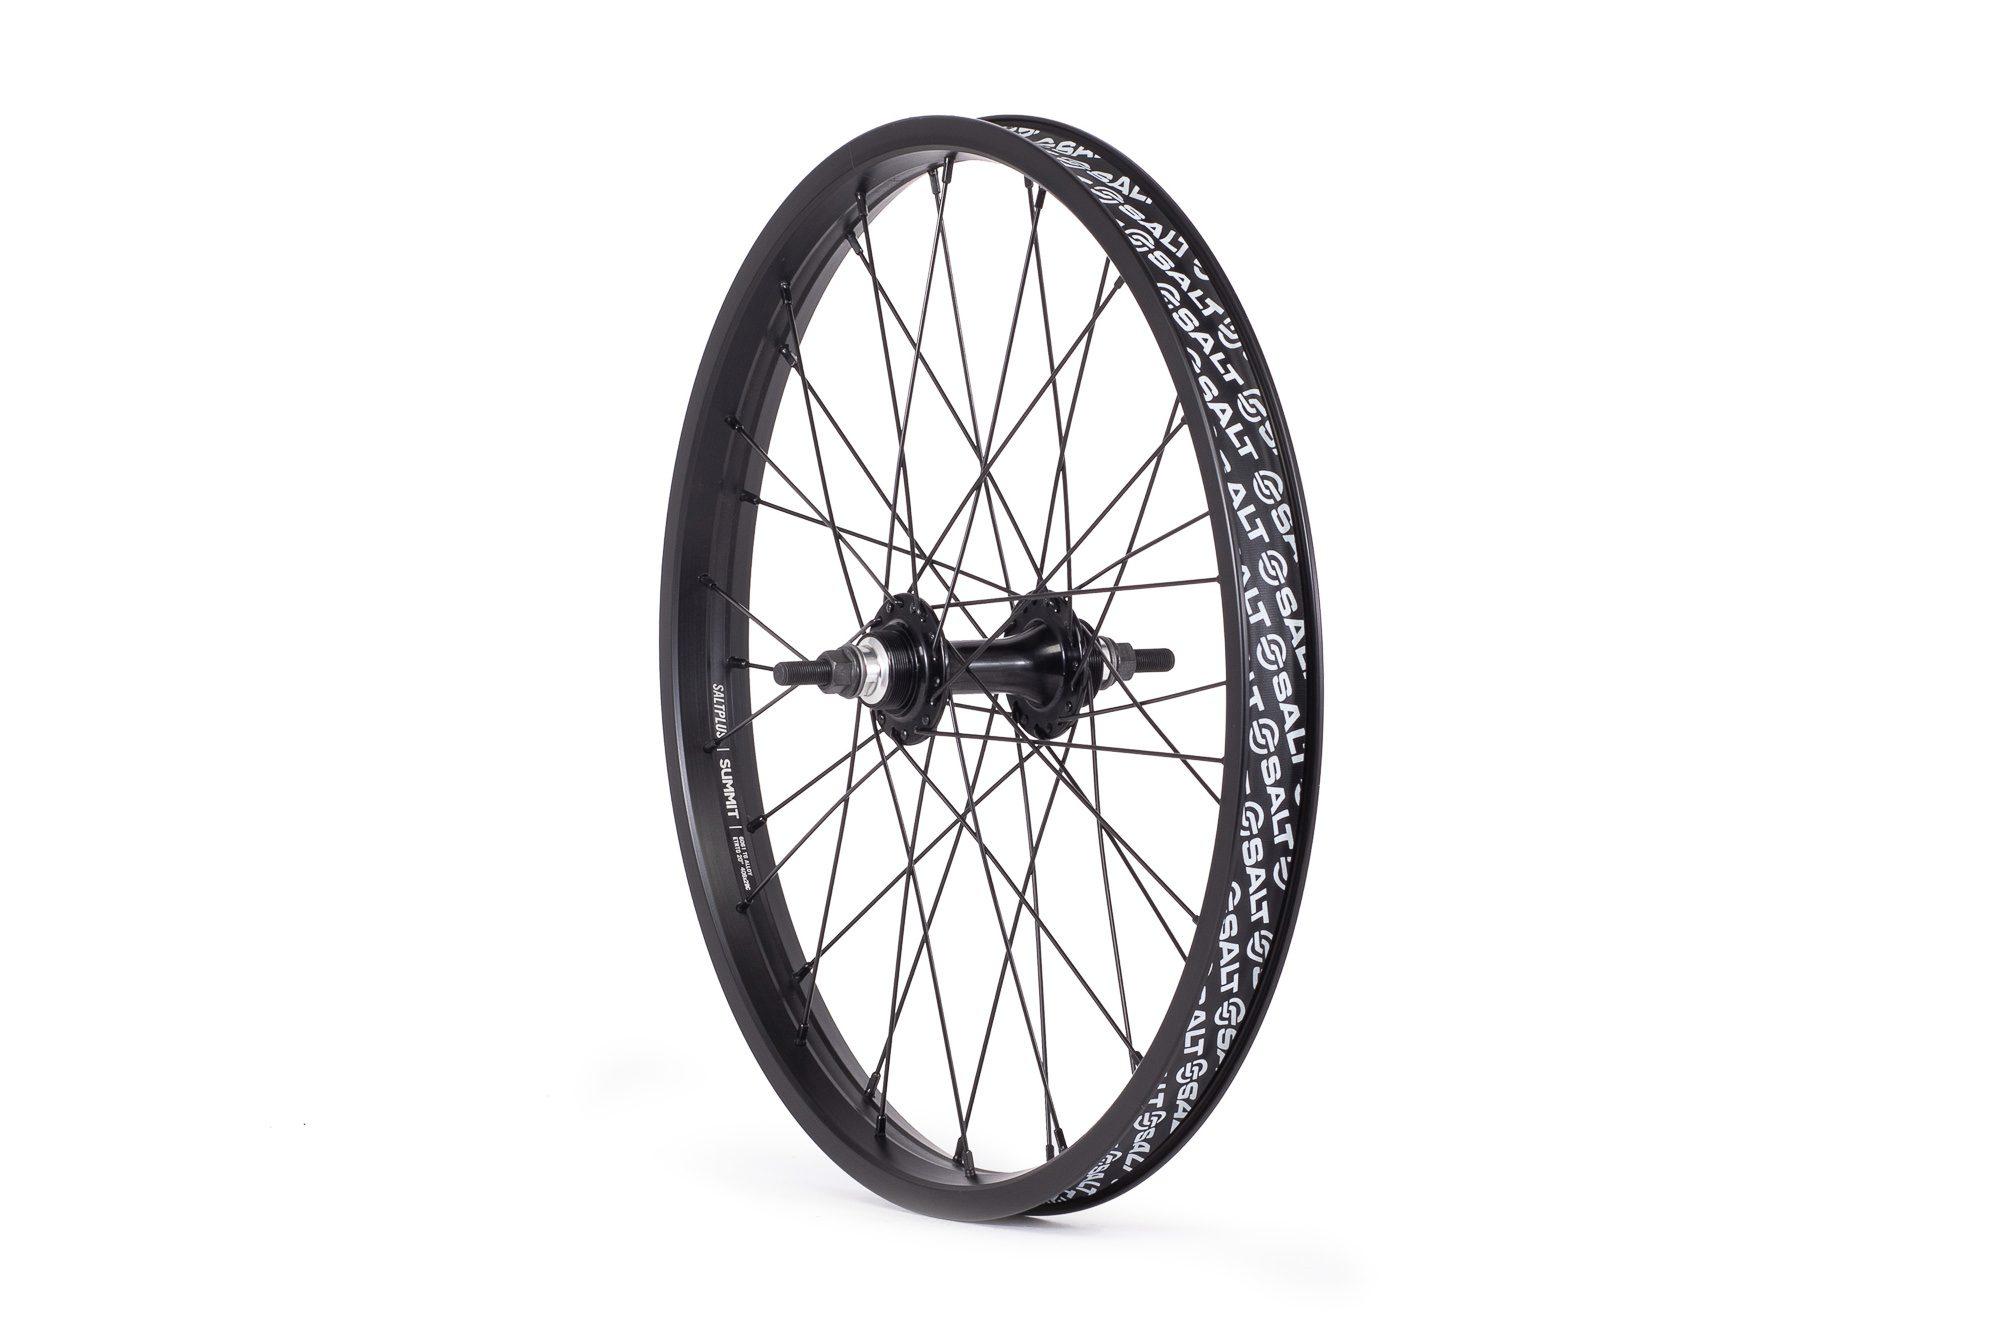 Salt_Everest_flipflop_rear_wheel_black_02